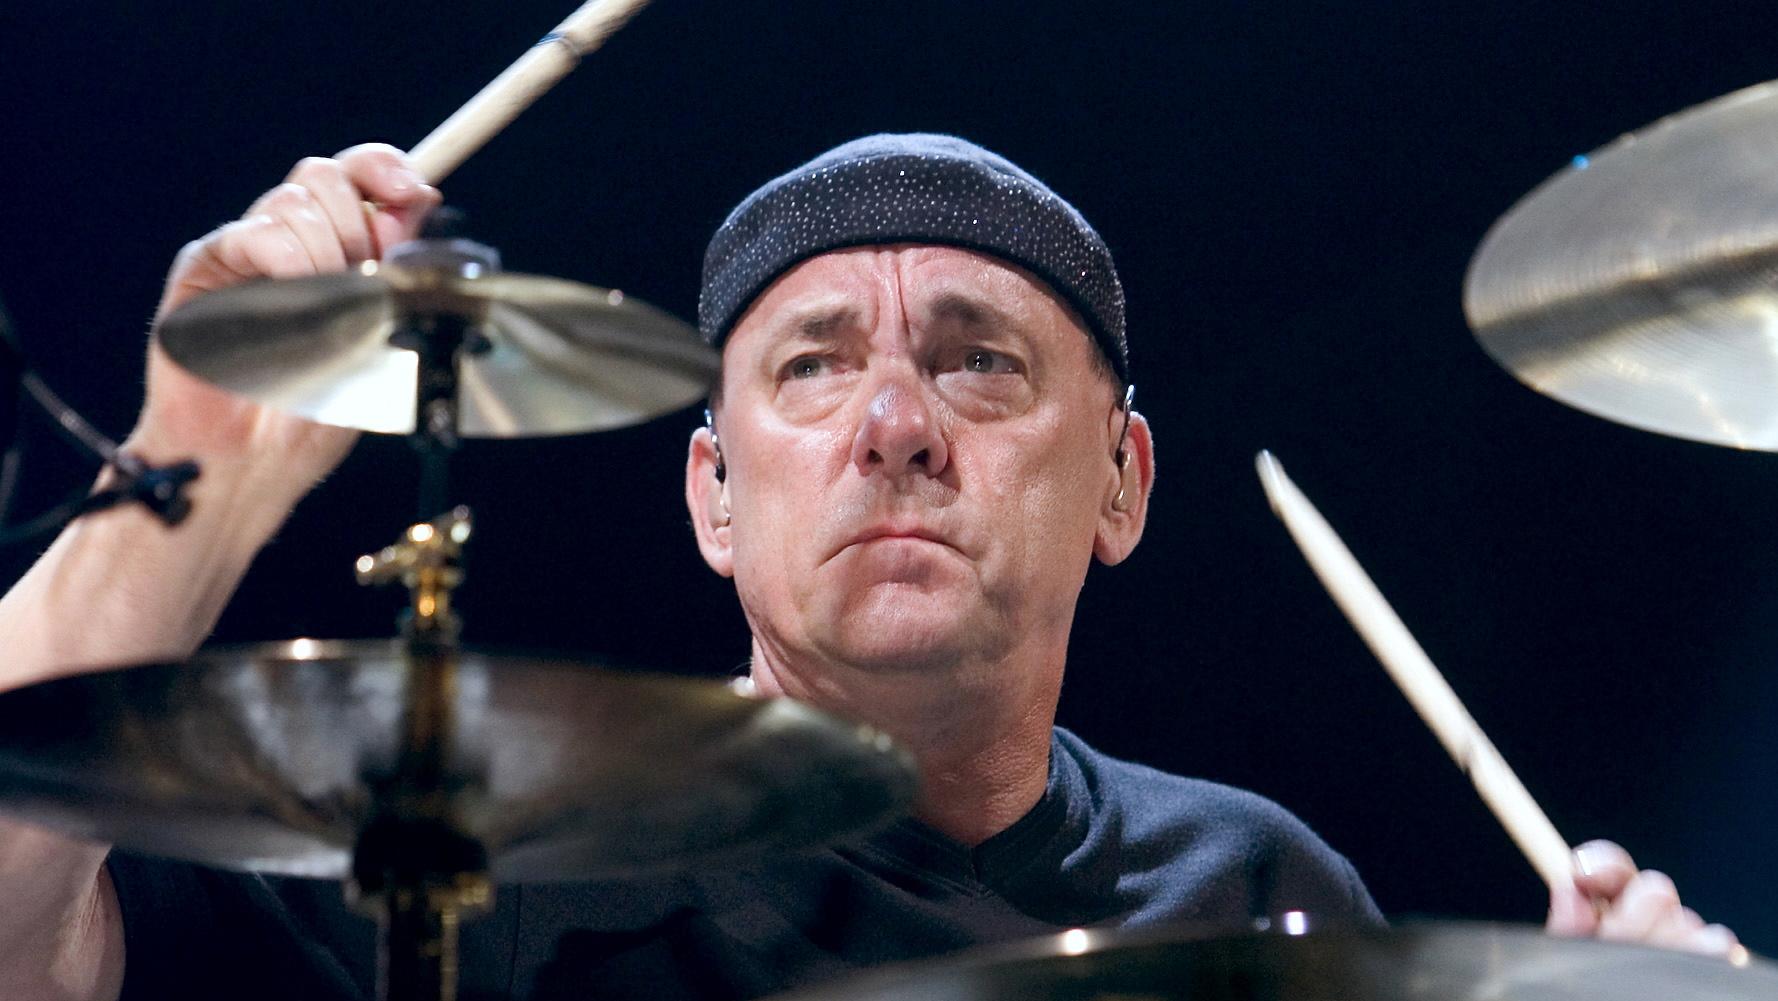 Musicians mourn loss of 'ambassador of Canadian rock music'